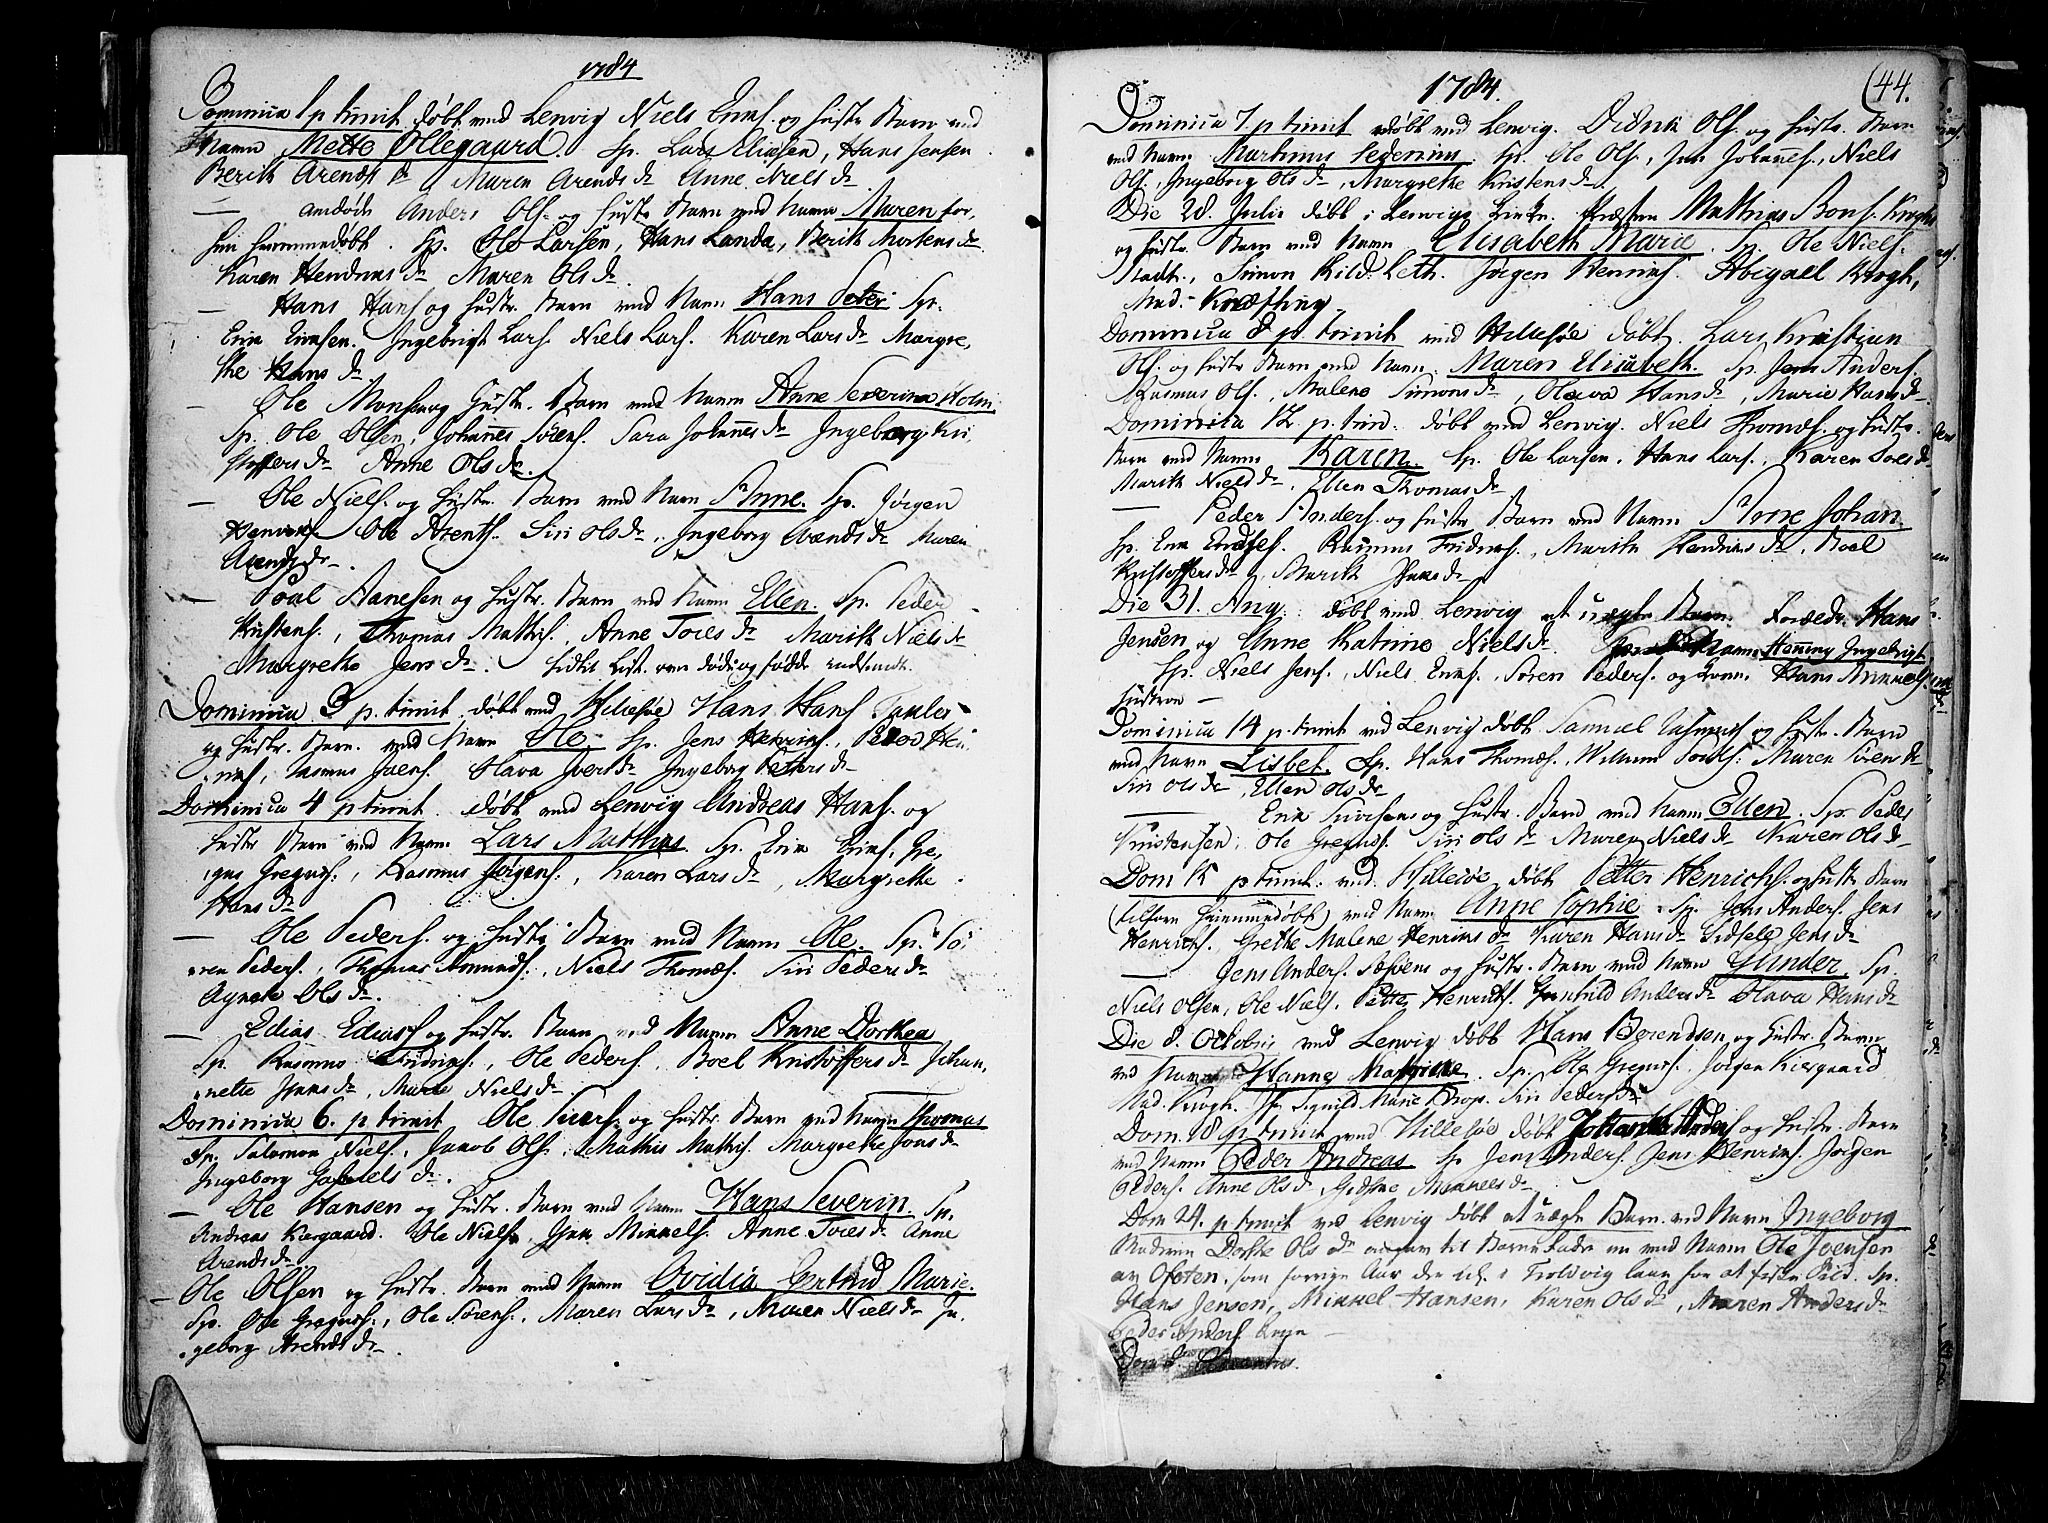 SATØ, Lenvik sokneprestembete, H/Ha/Haa/L0002kirke: Ministerialbok nr. 2, 1784-1820, s. 44